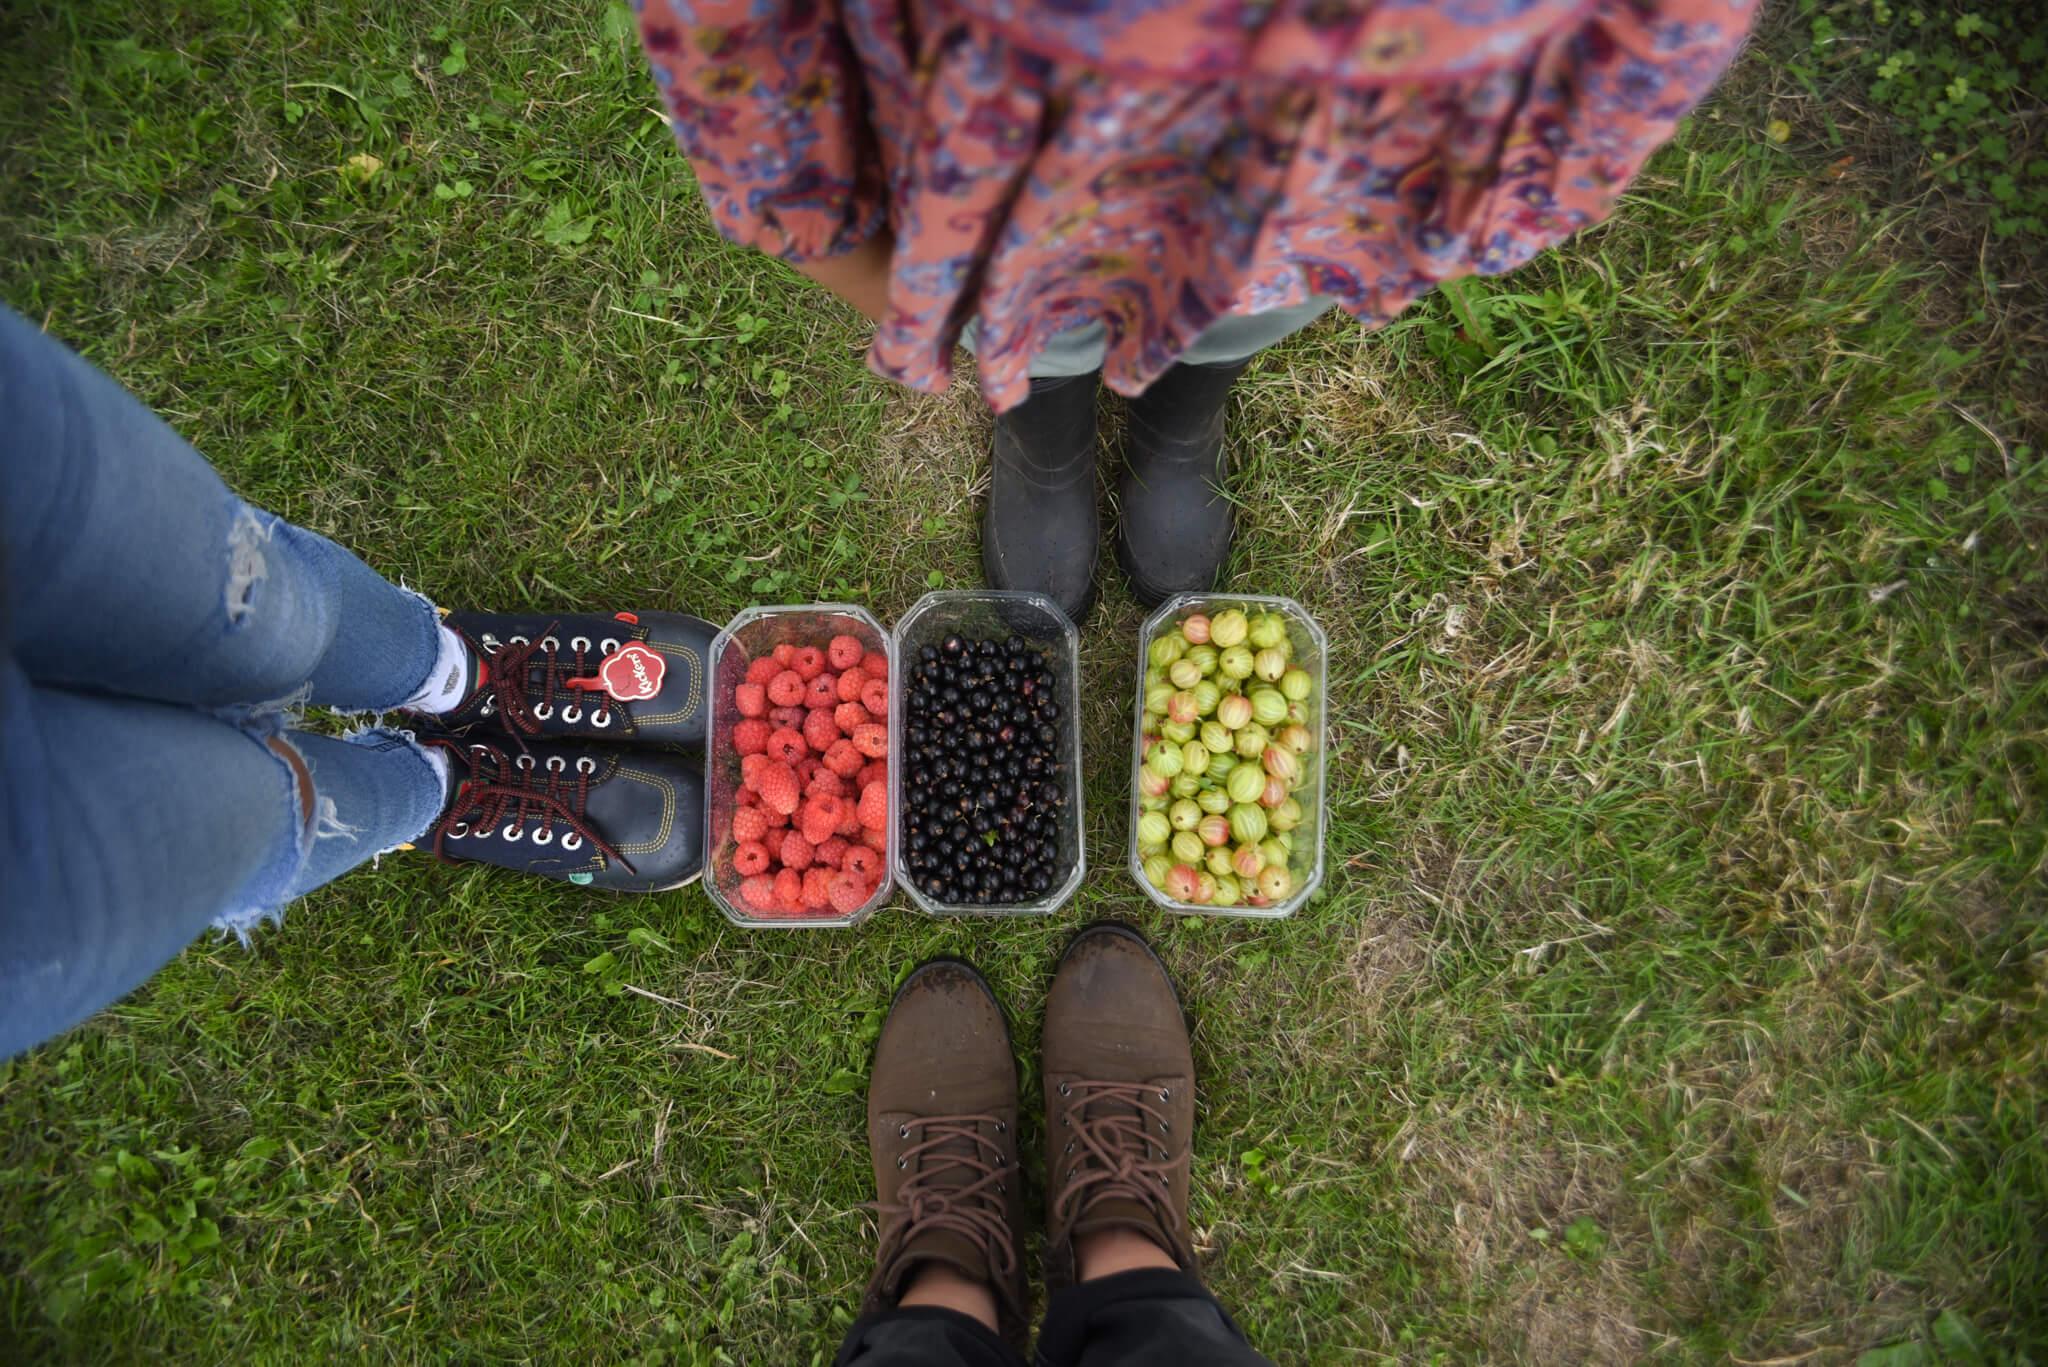 Scaddows fruit